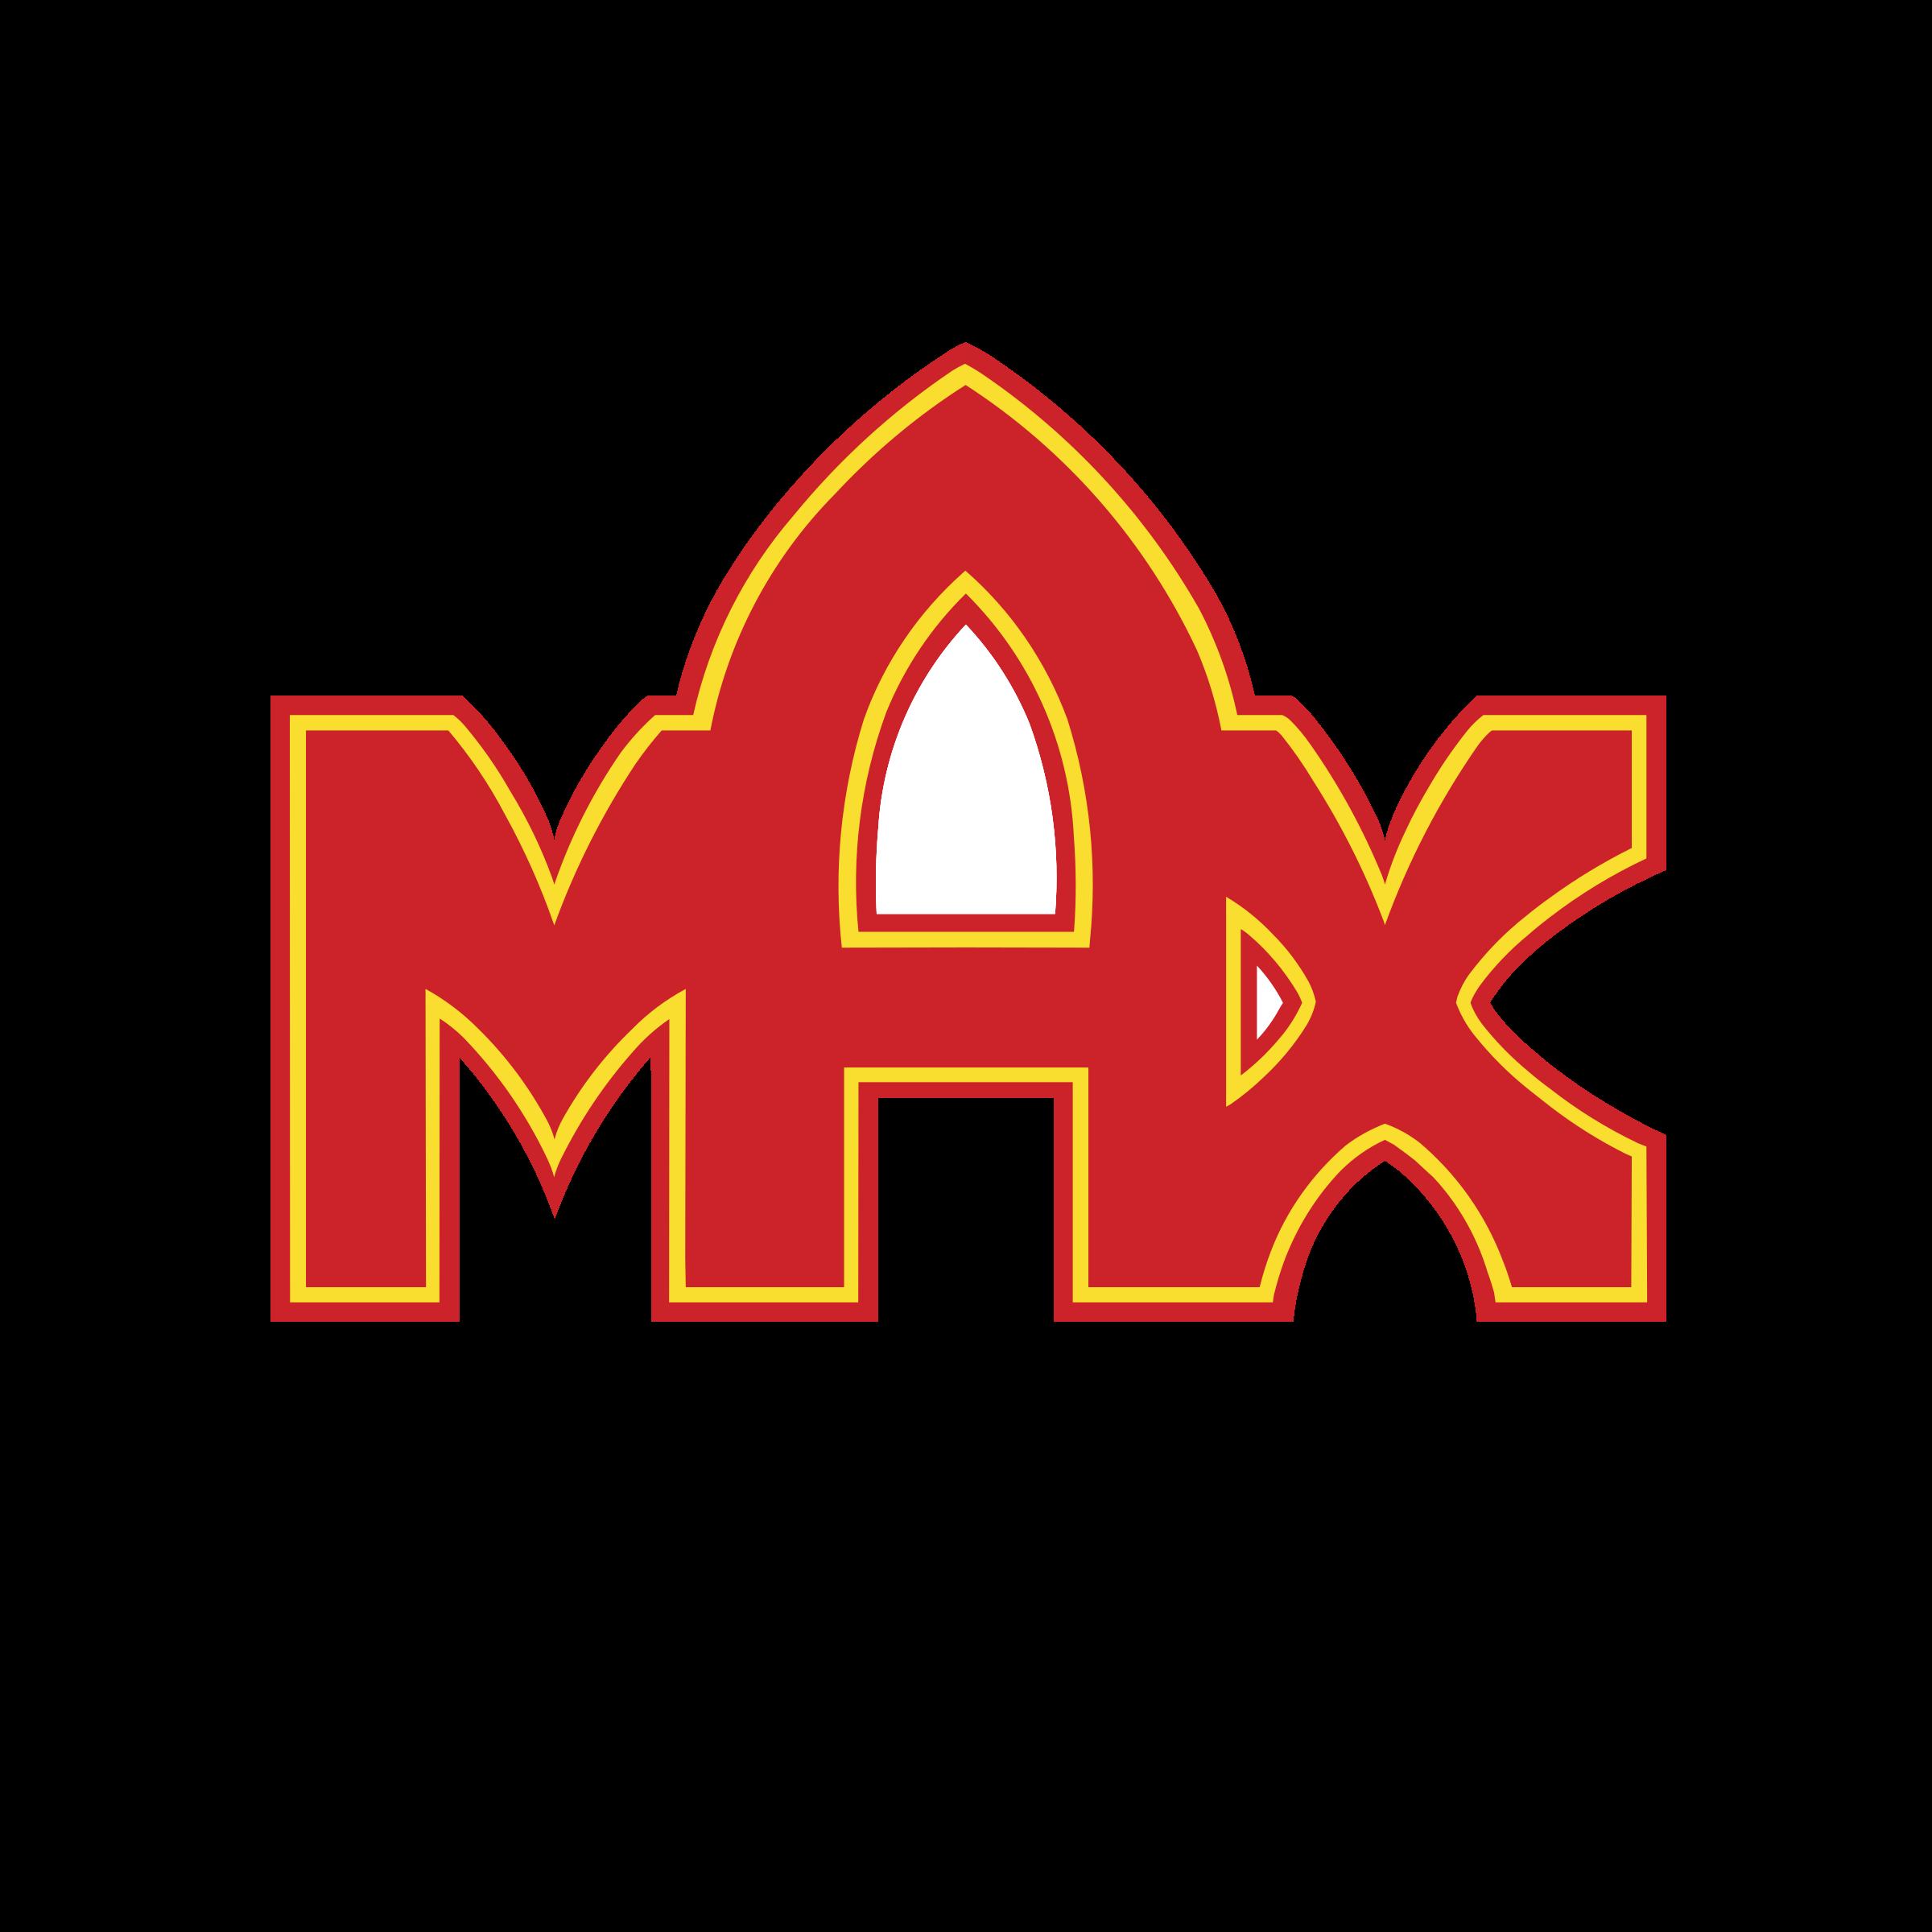 Max Hamburgare Logo Png Transparent Svg Vector Freebie Supply